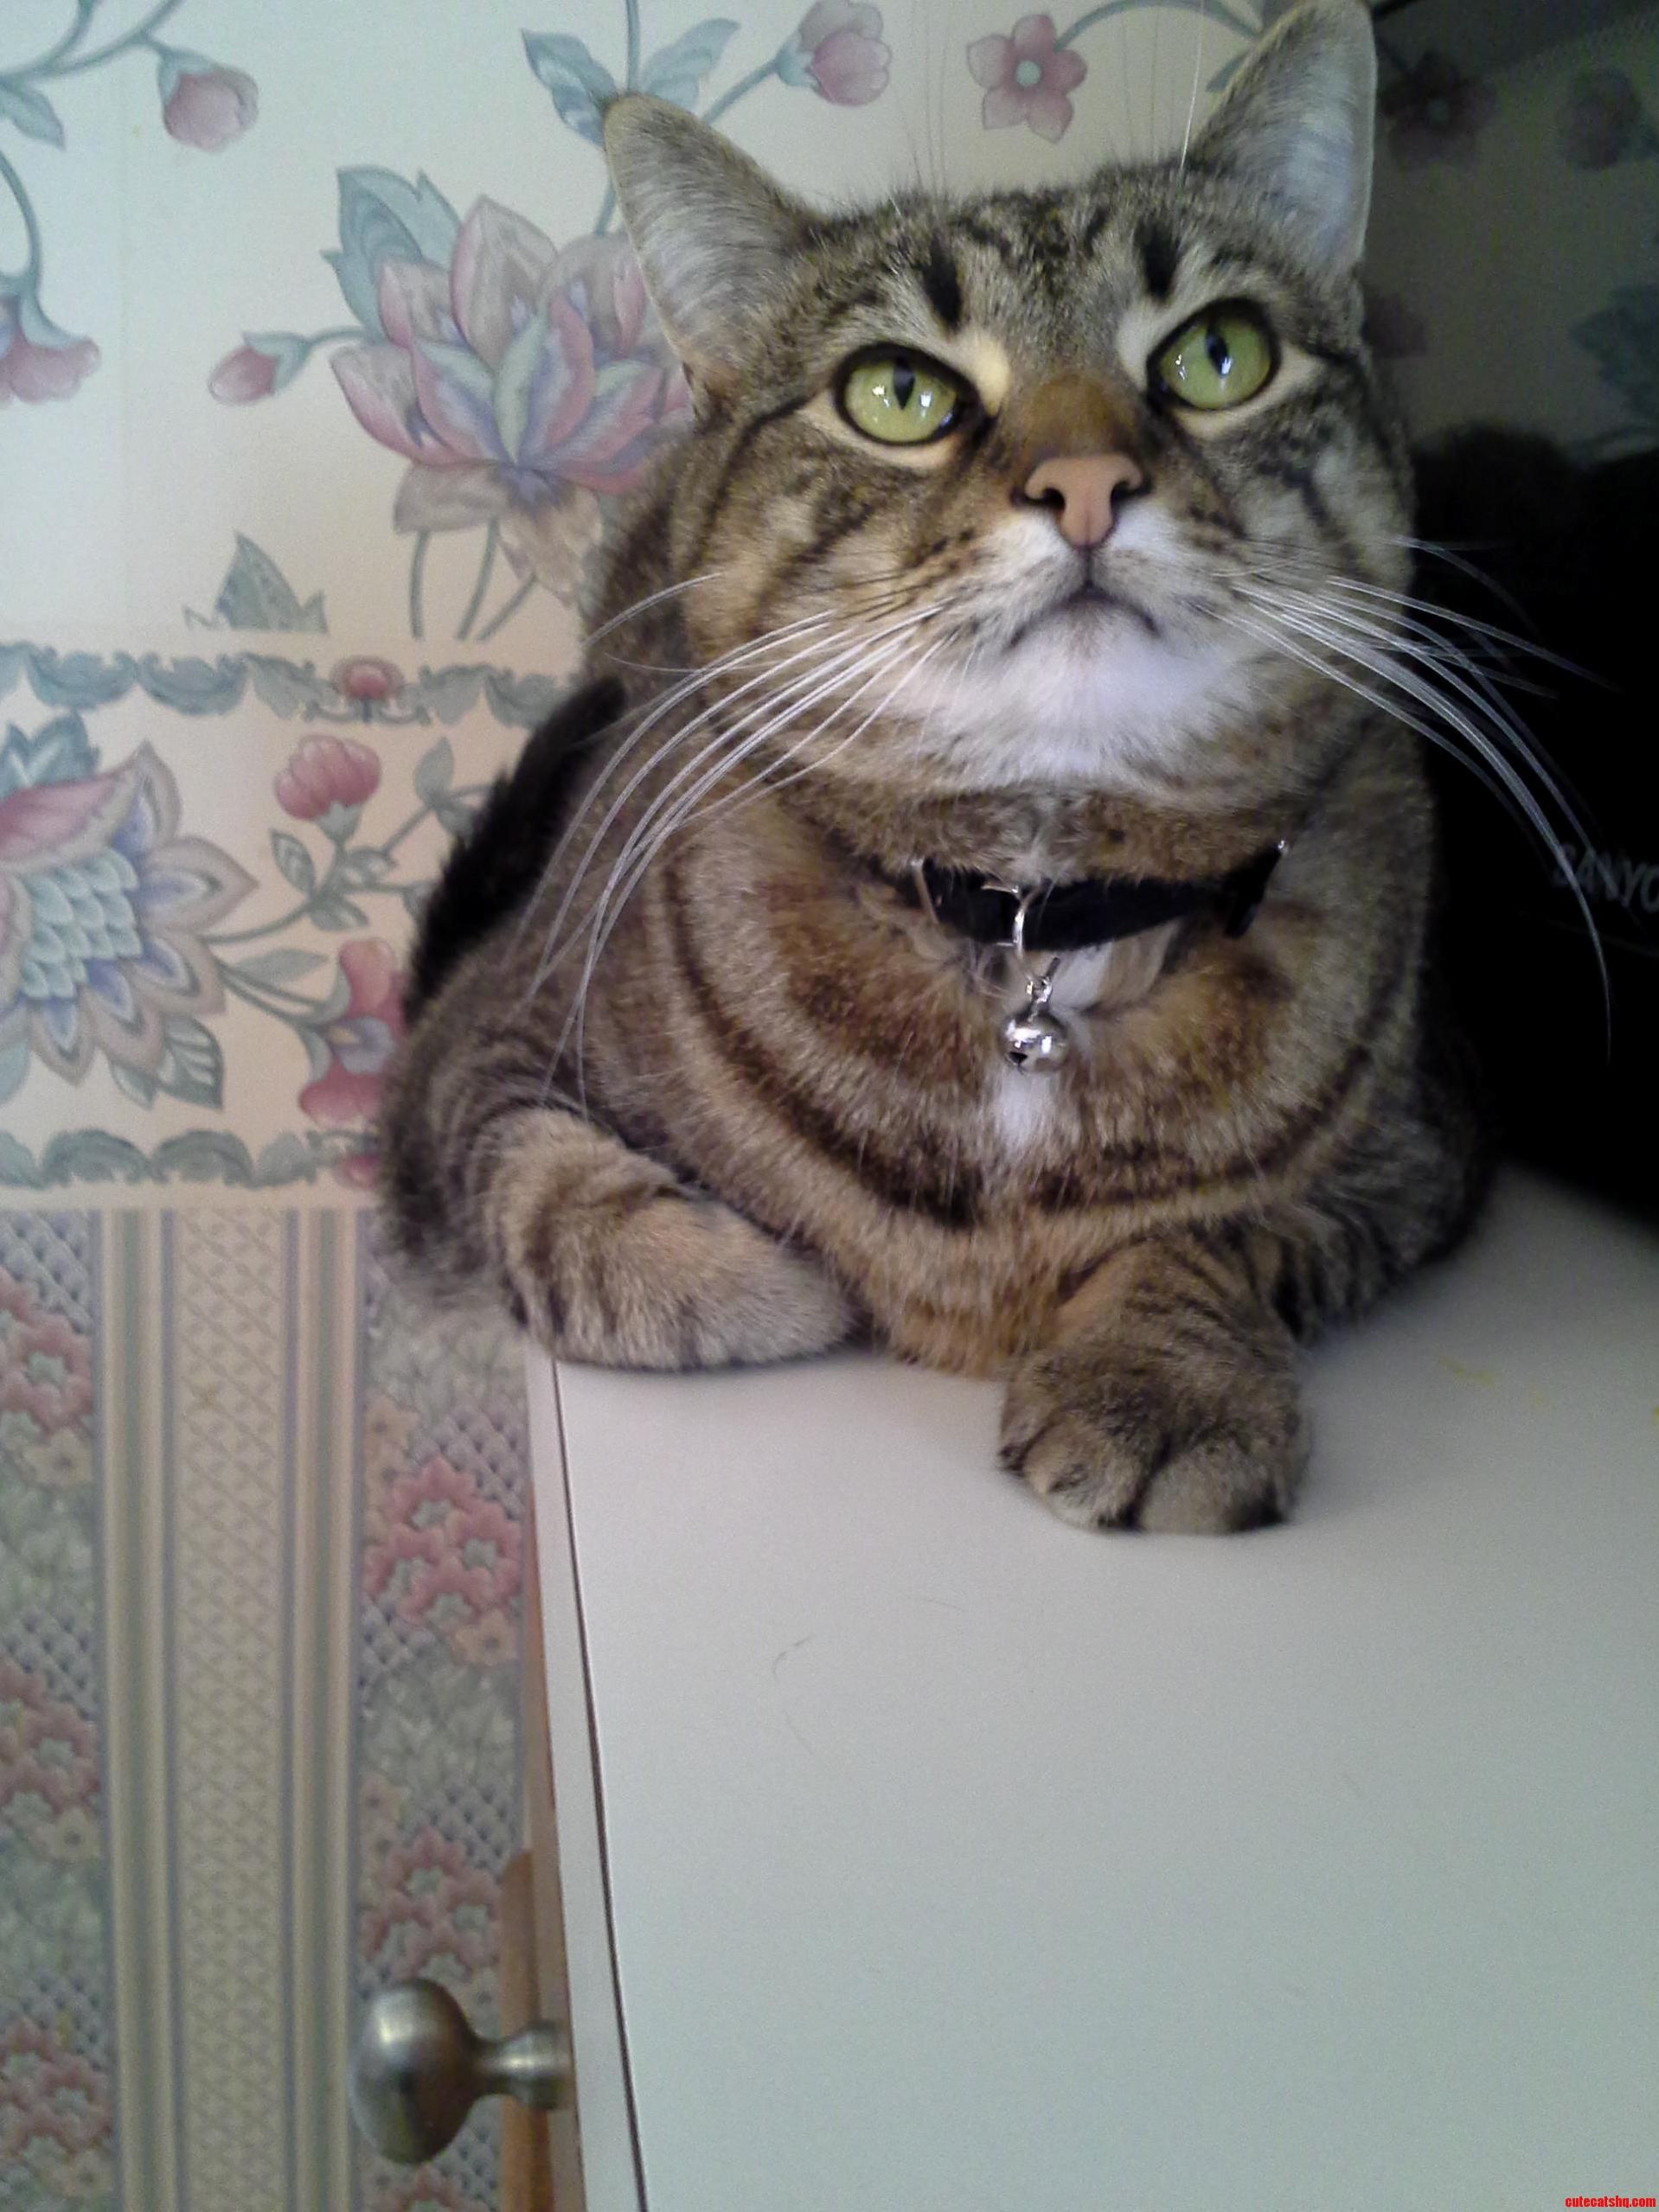 Dem Whiskers.